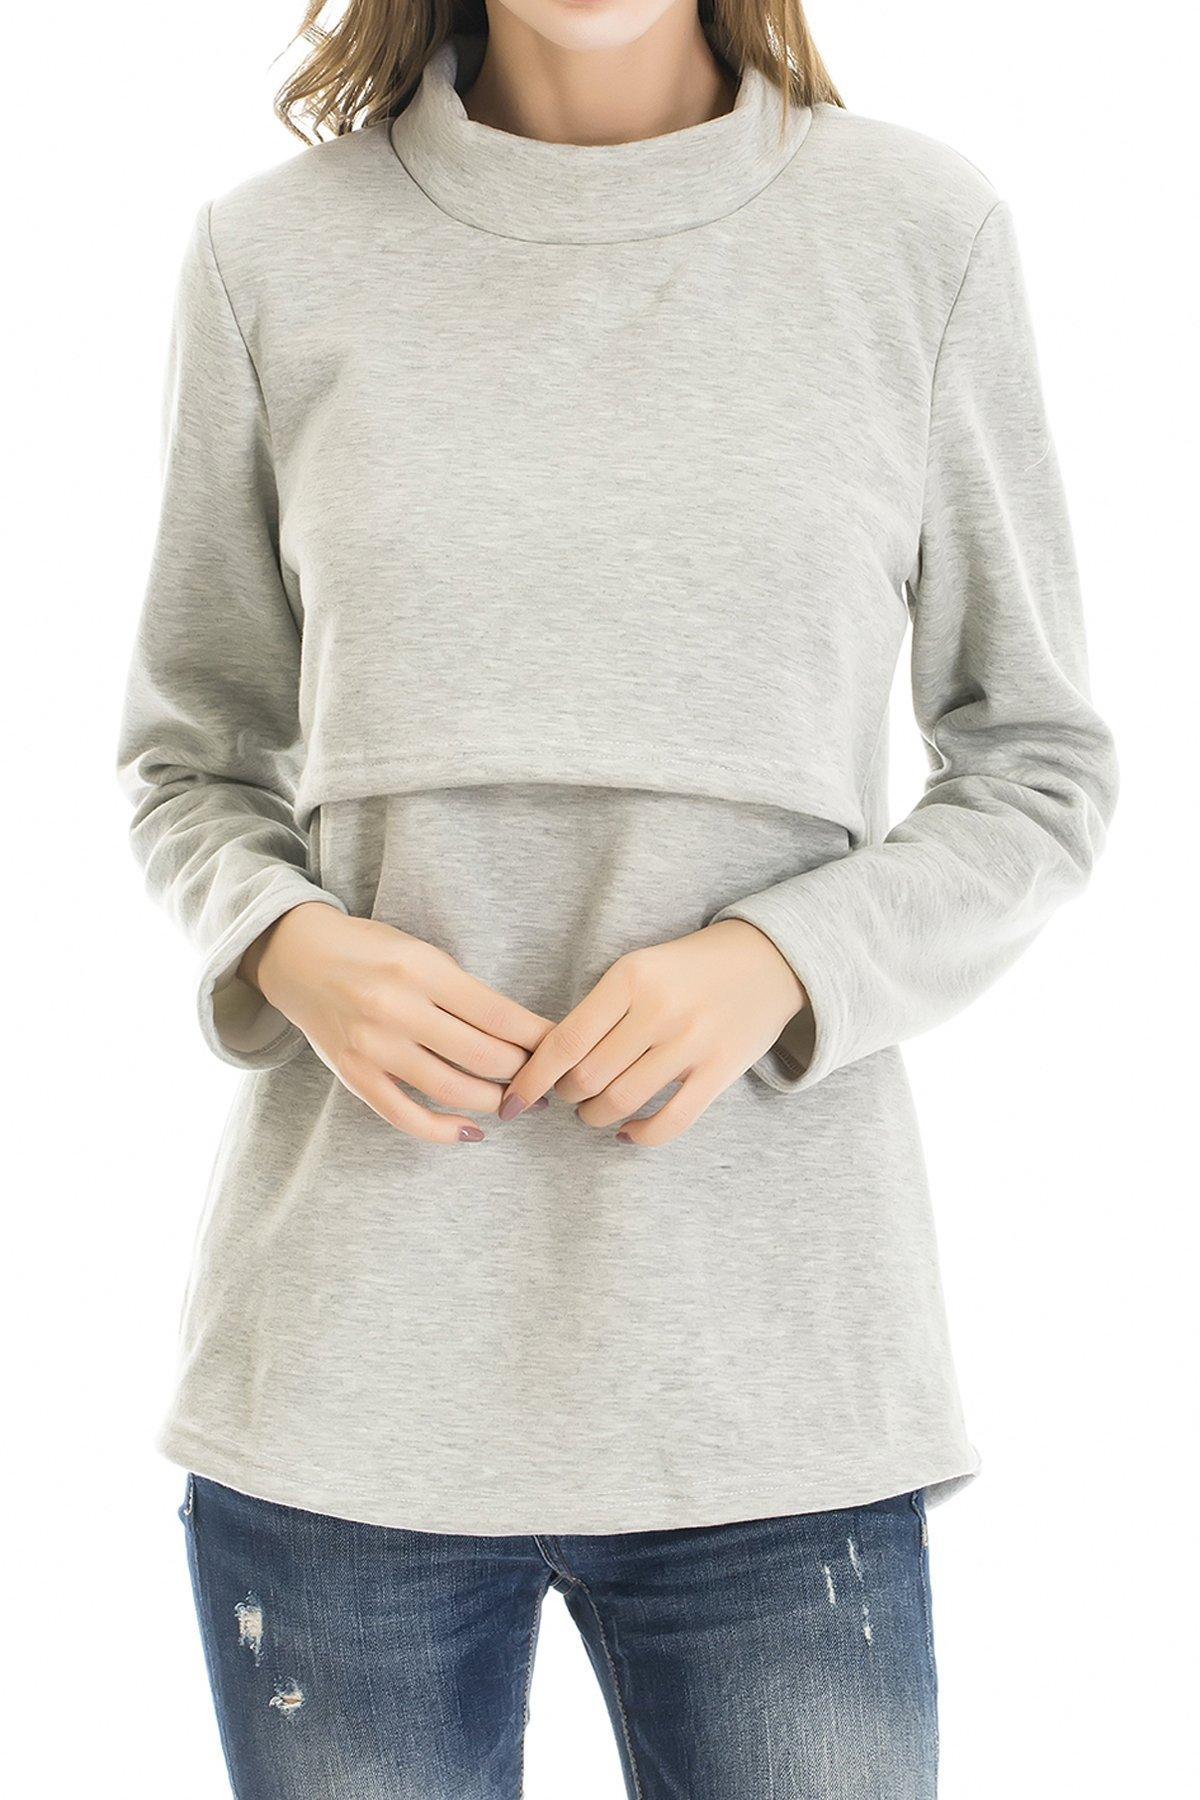 Smallshow Women's Fleece Nursing Tops Shirts Long Sleeve Breastfeeding Clothes Medium Light Grey